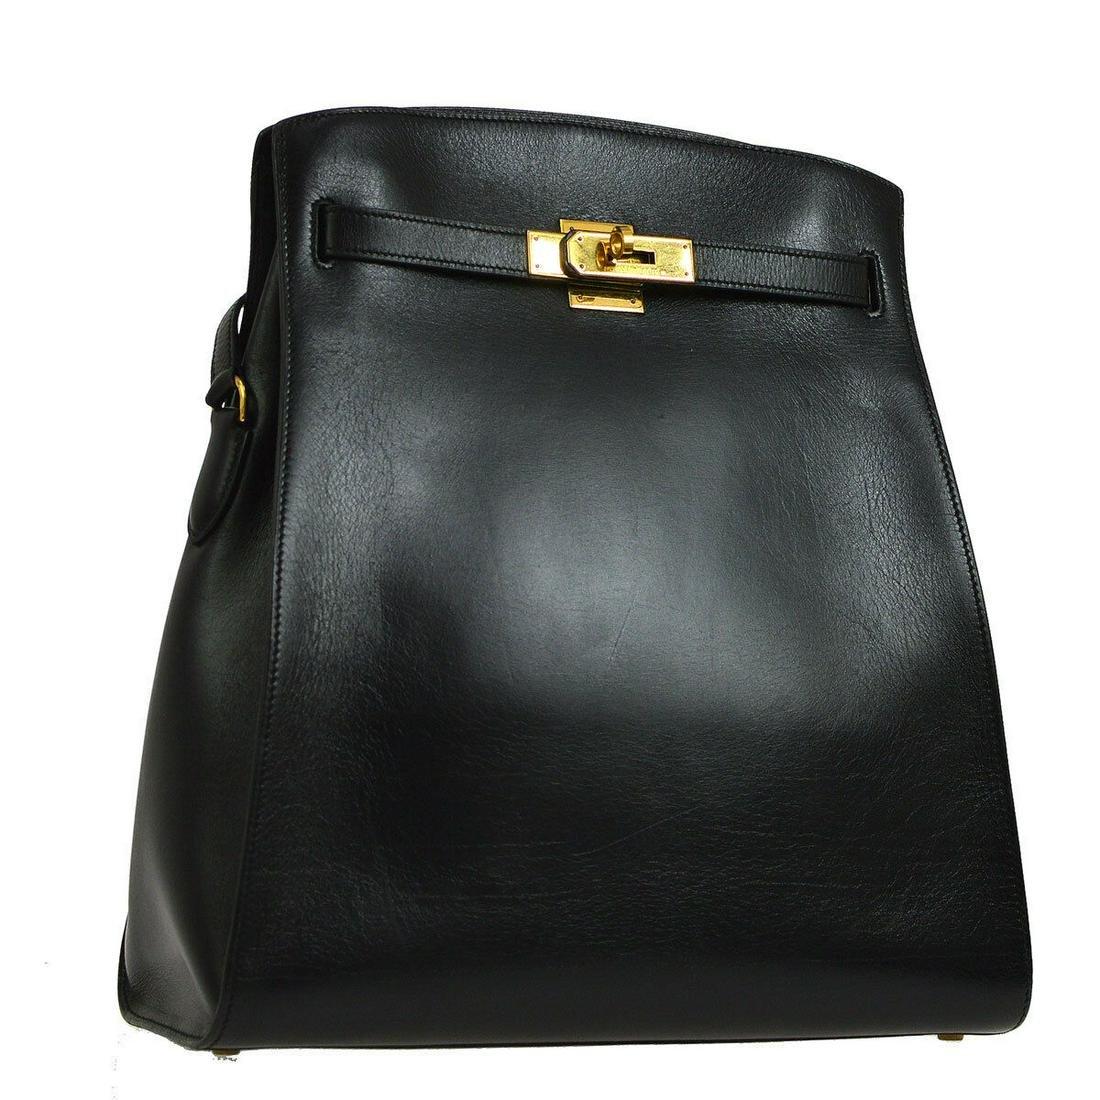 Authentic HERMES KELLY Box Calf Shoulder Bag